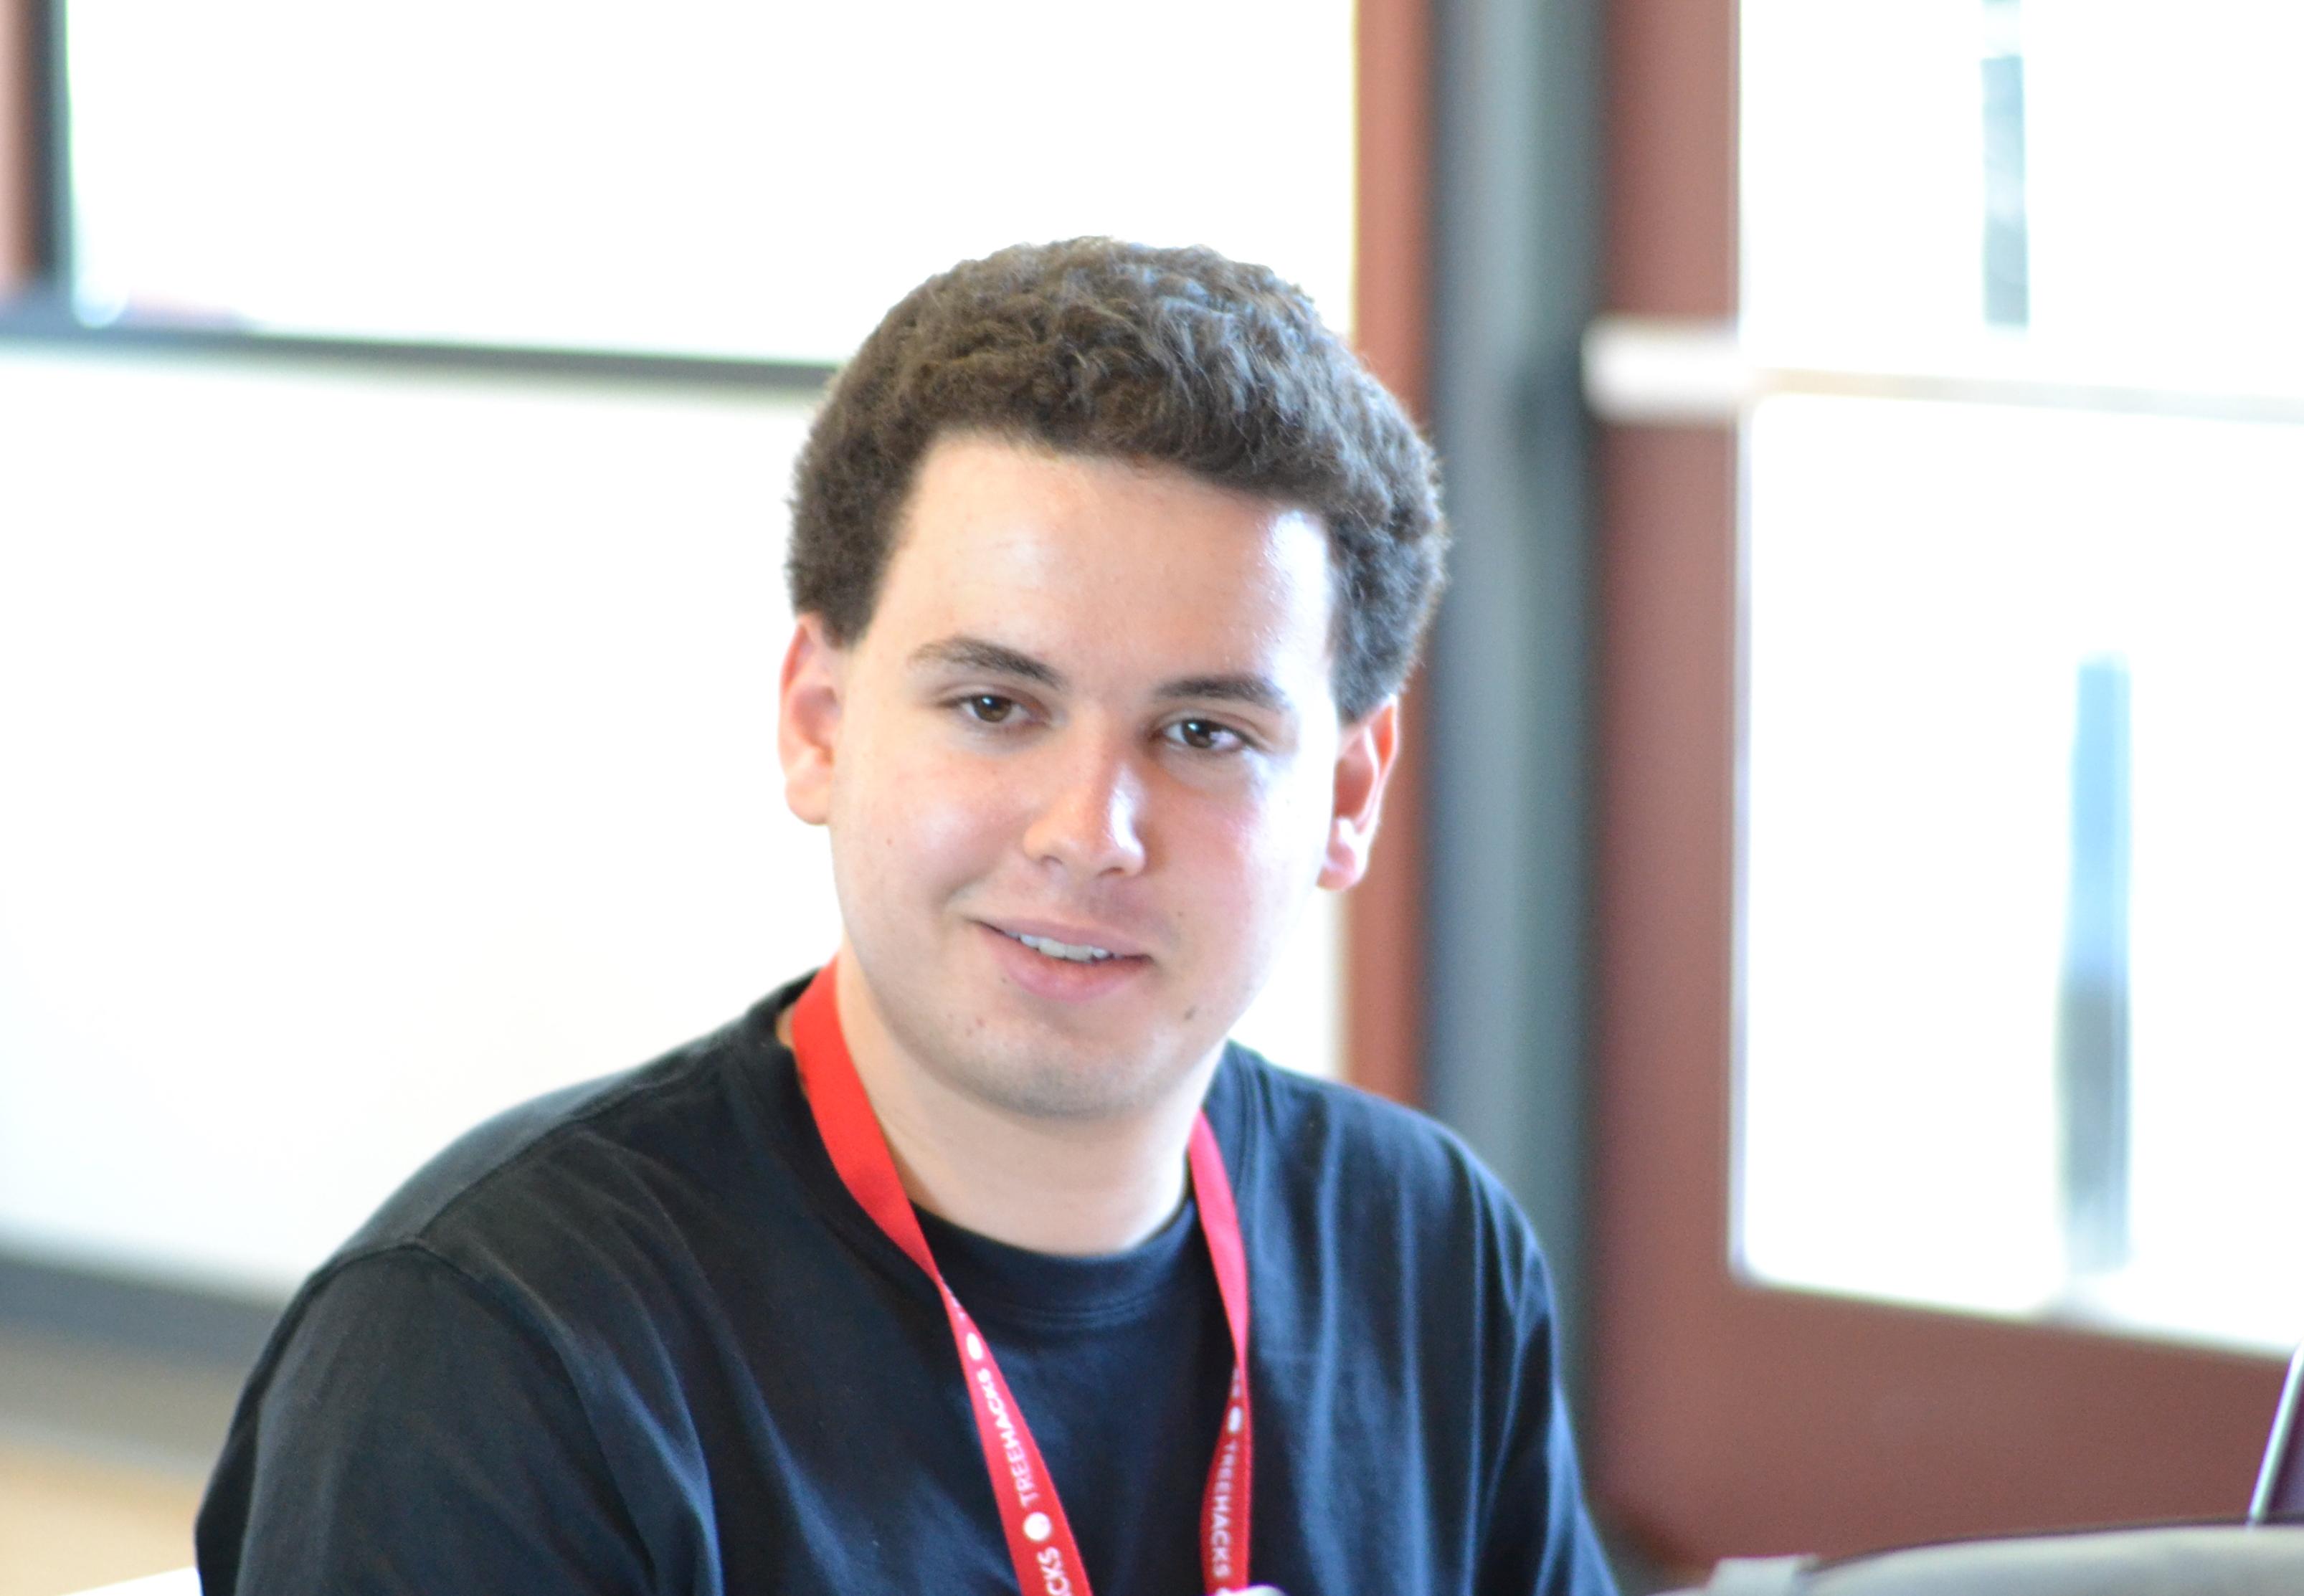 Sam Daitzman